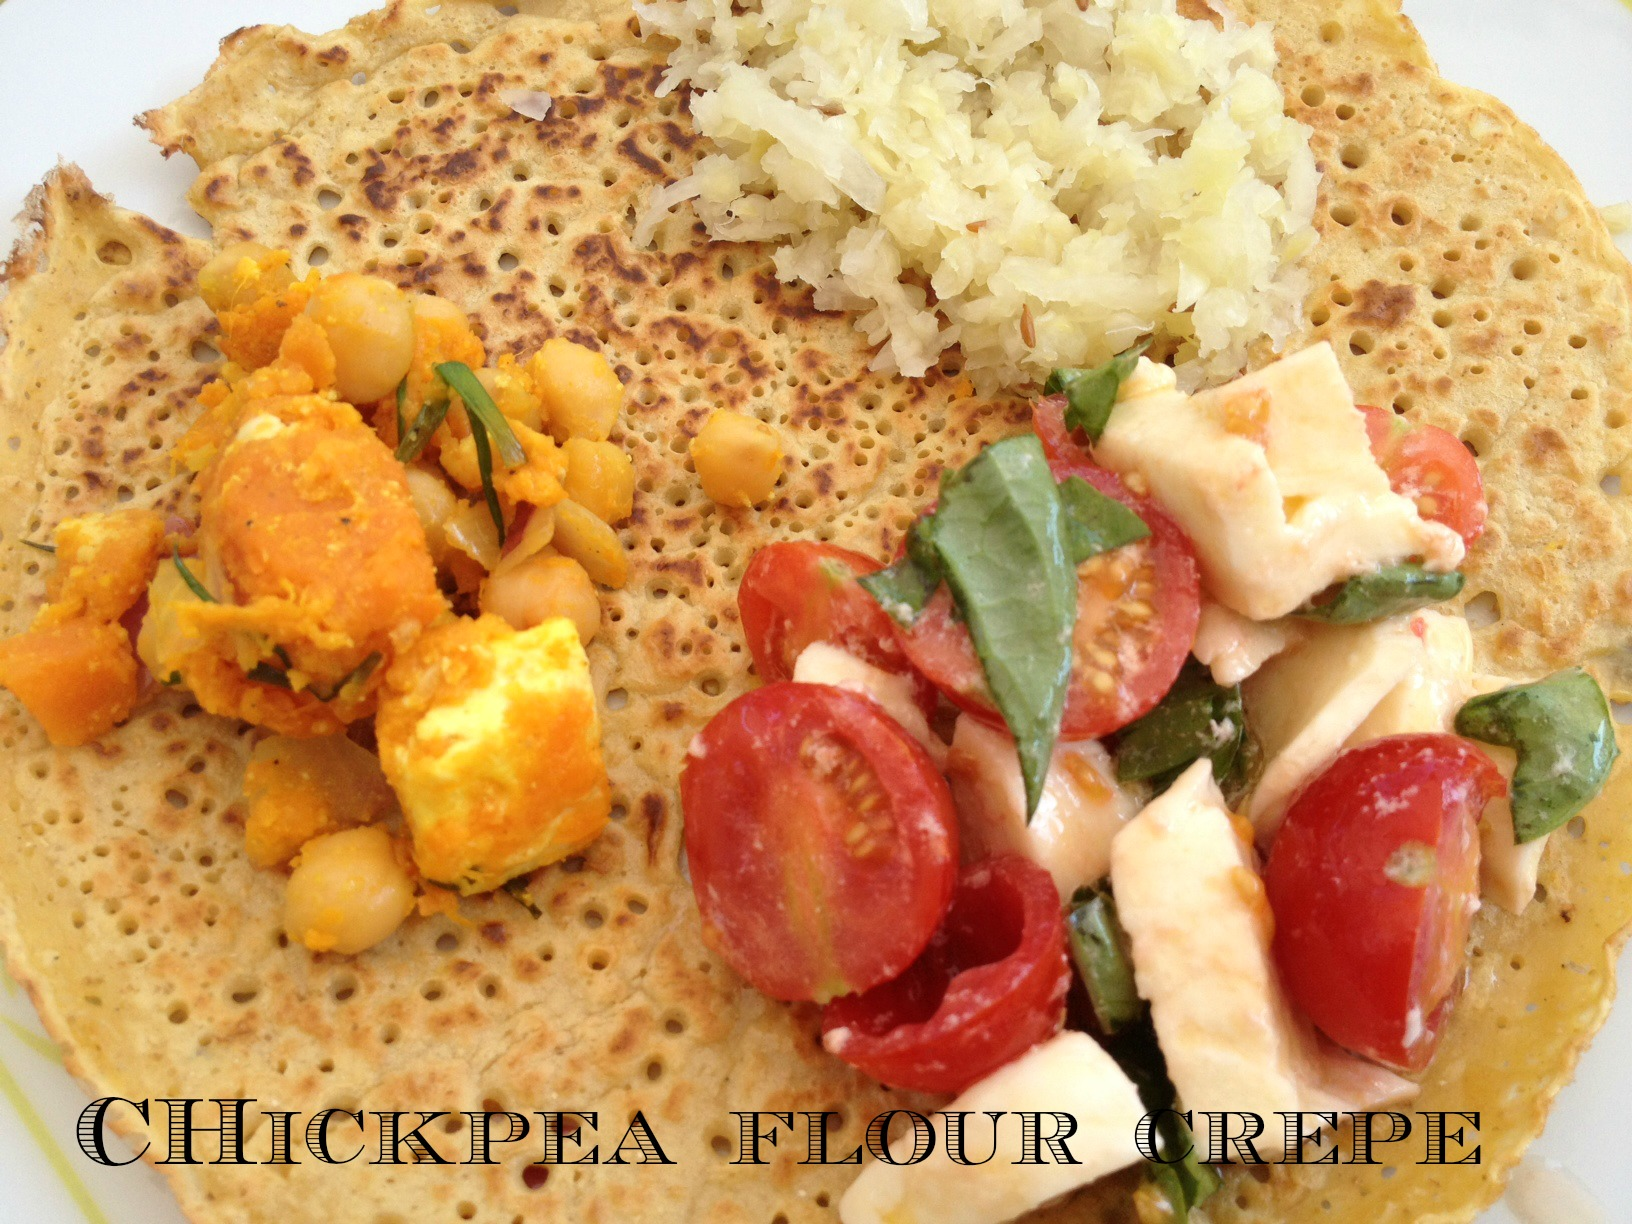 Chickpea flour crepe